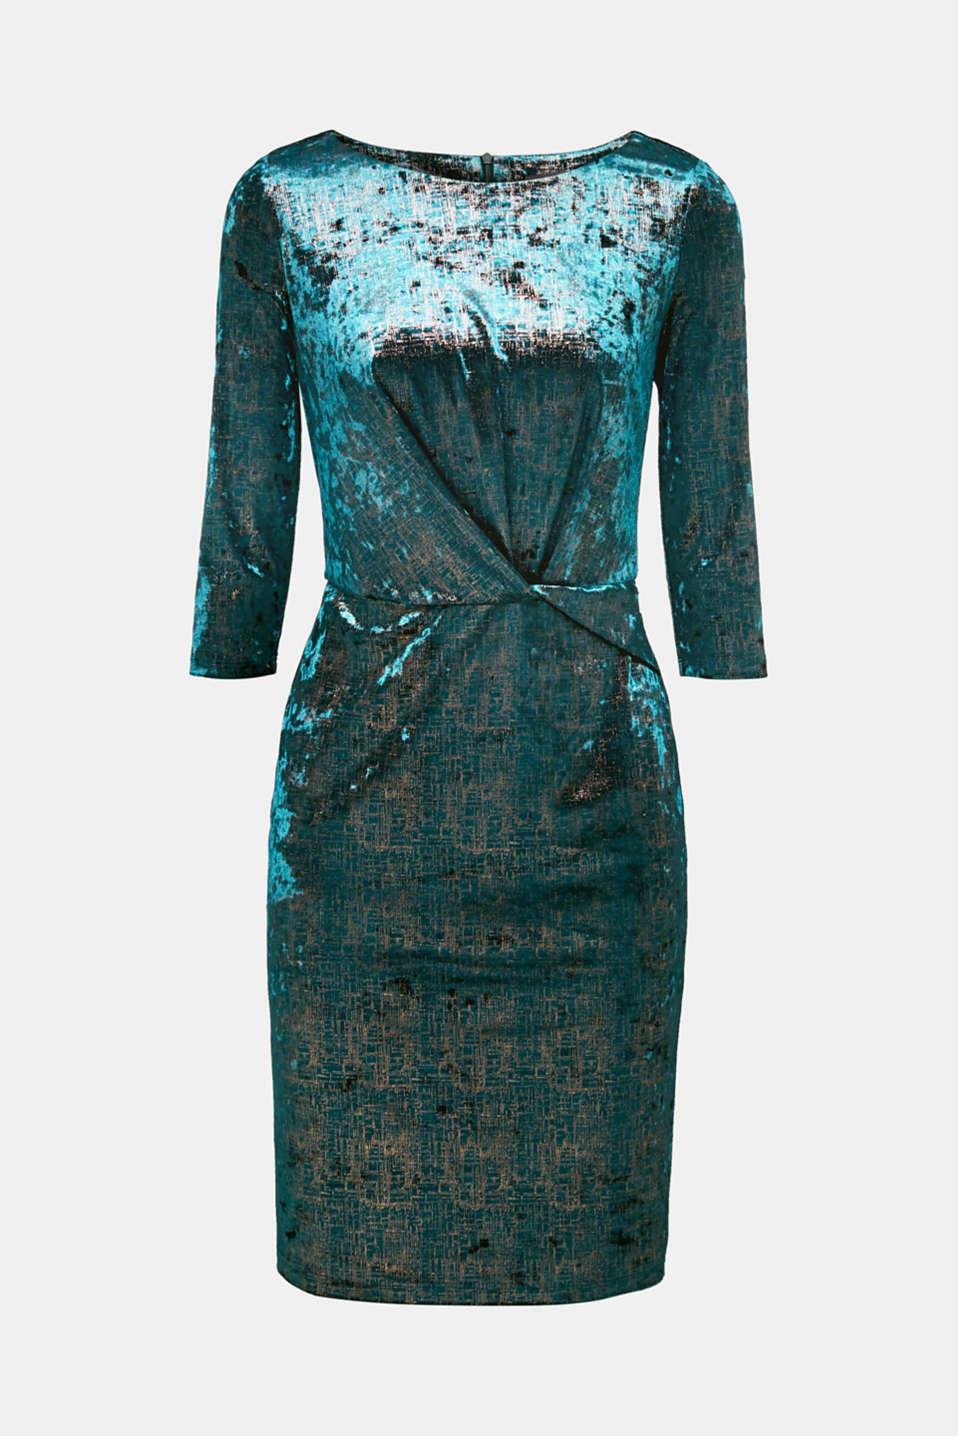 Dresses knitted, DARK TEAL GREEN, detail image number 6